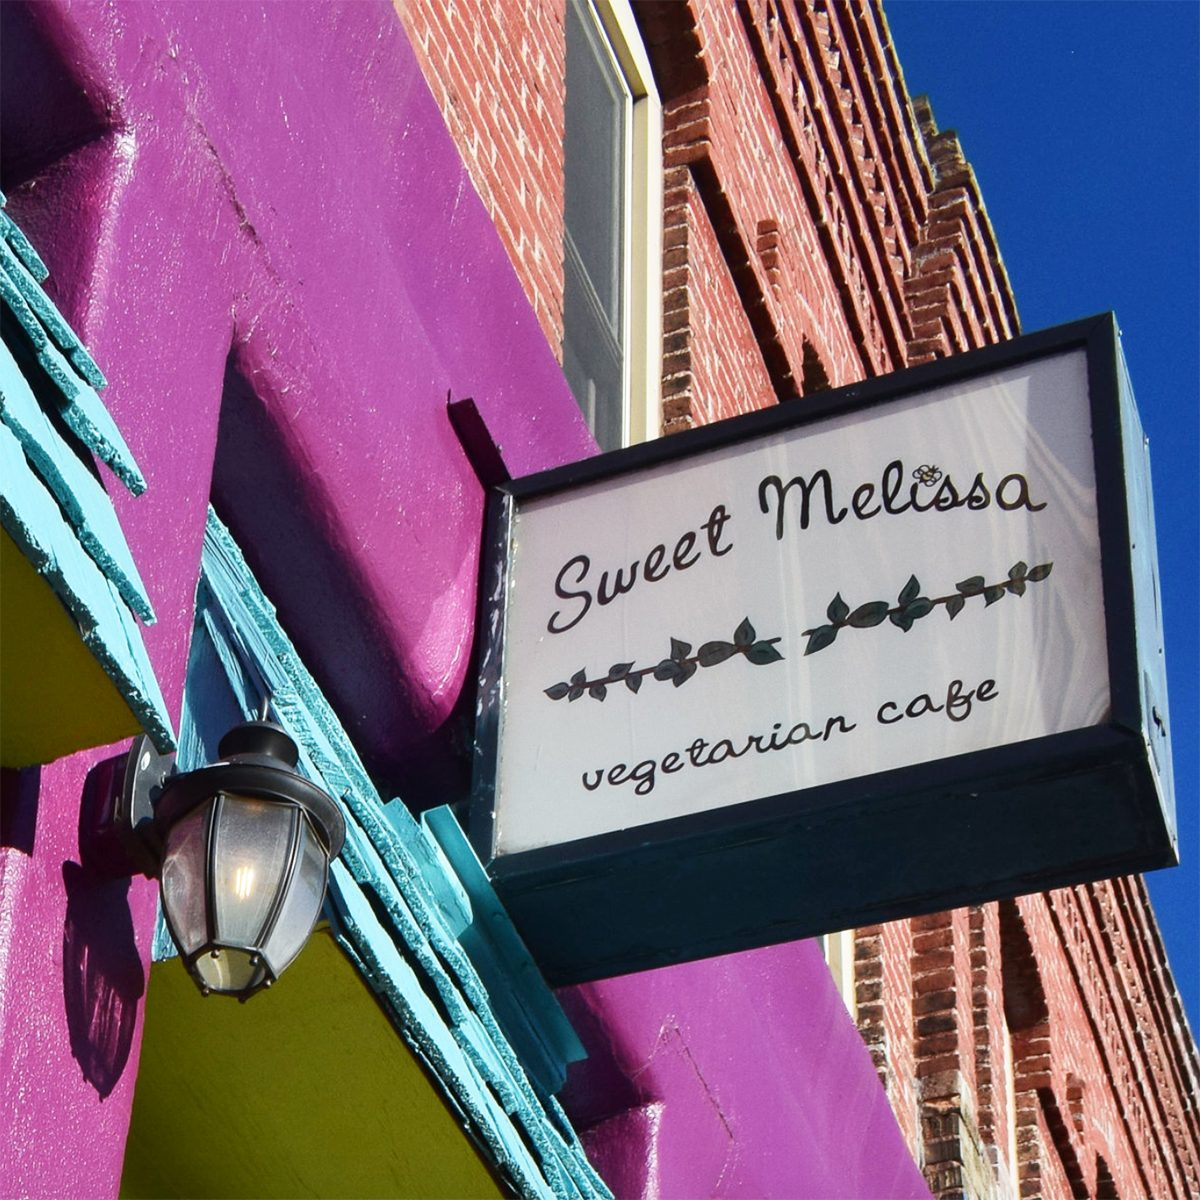 Best vegetarian restaurant in Wyoming Sweet Melissa